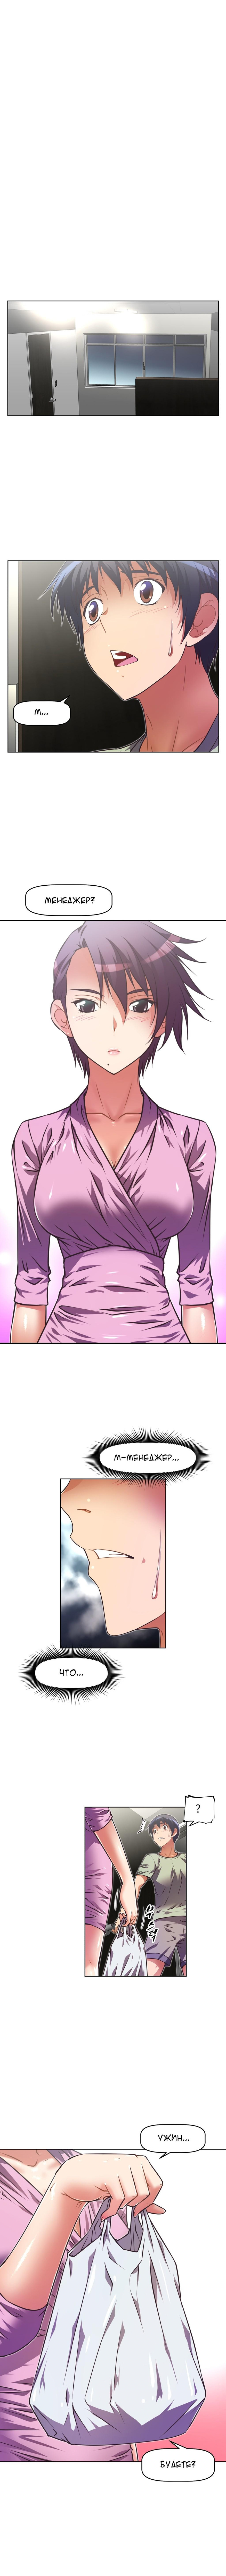 https://ru.mangadogs.com/comics/pic6/56/39224/1478219/1565704669387.png Page 1